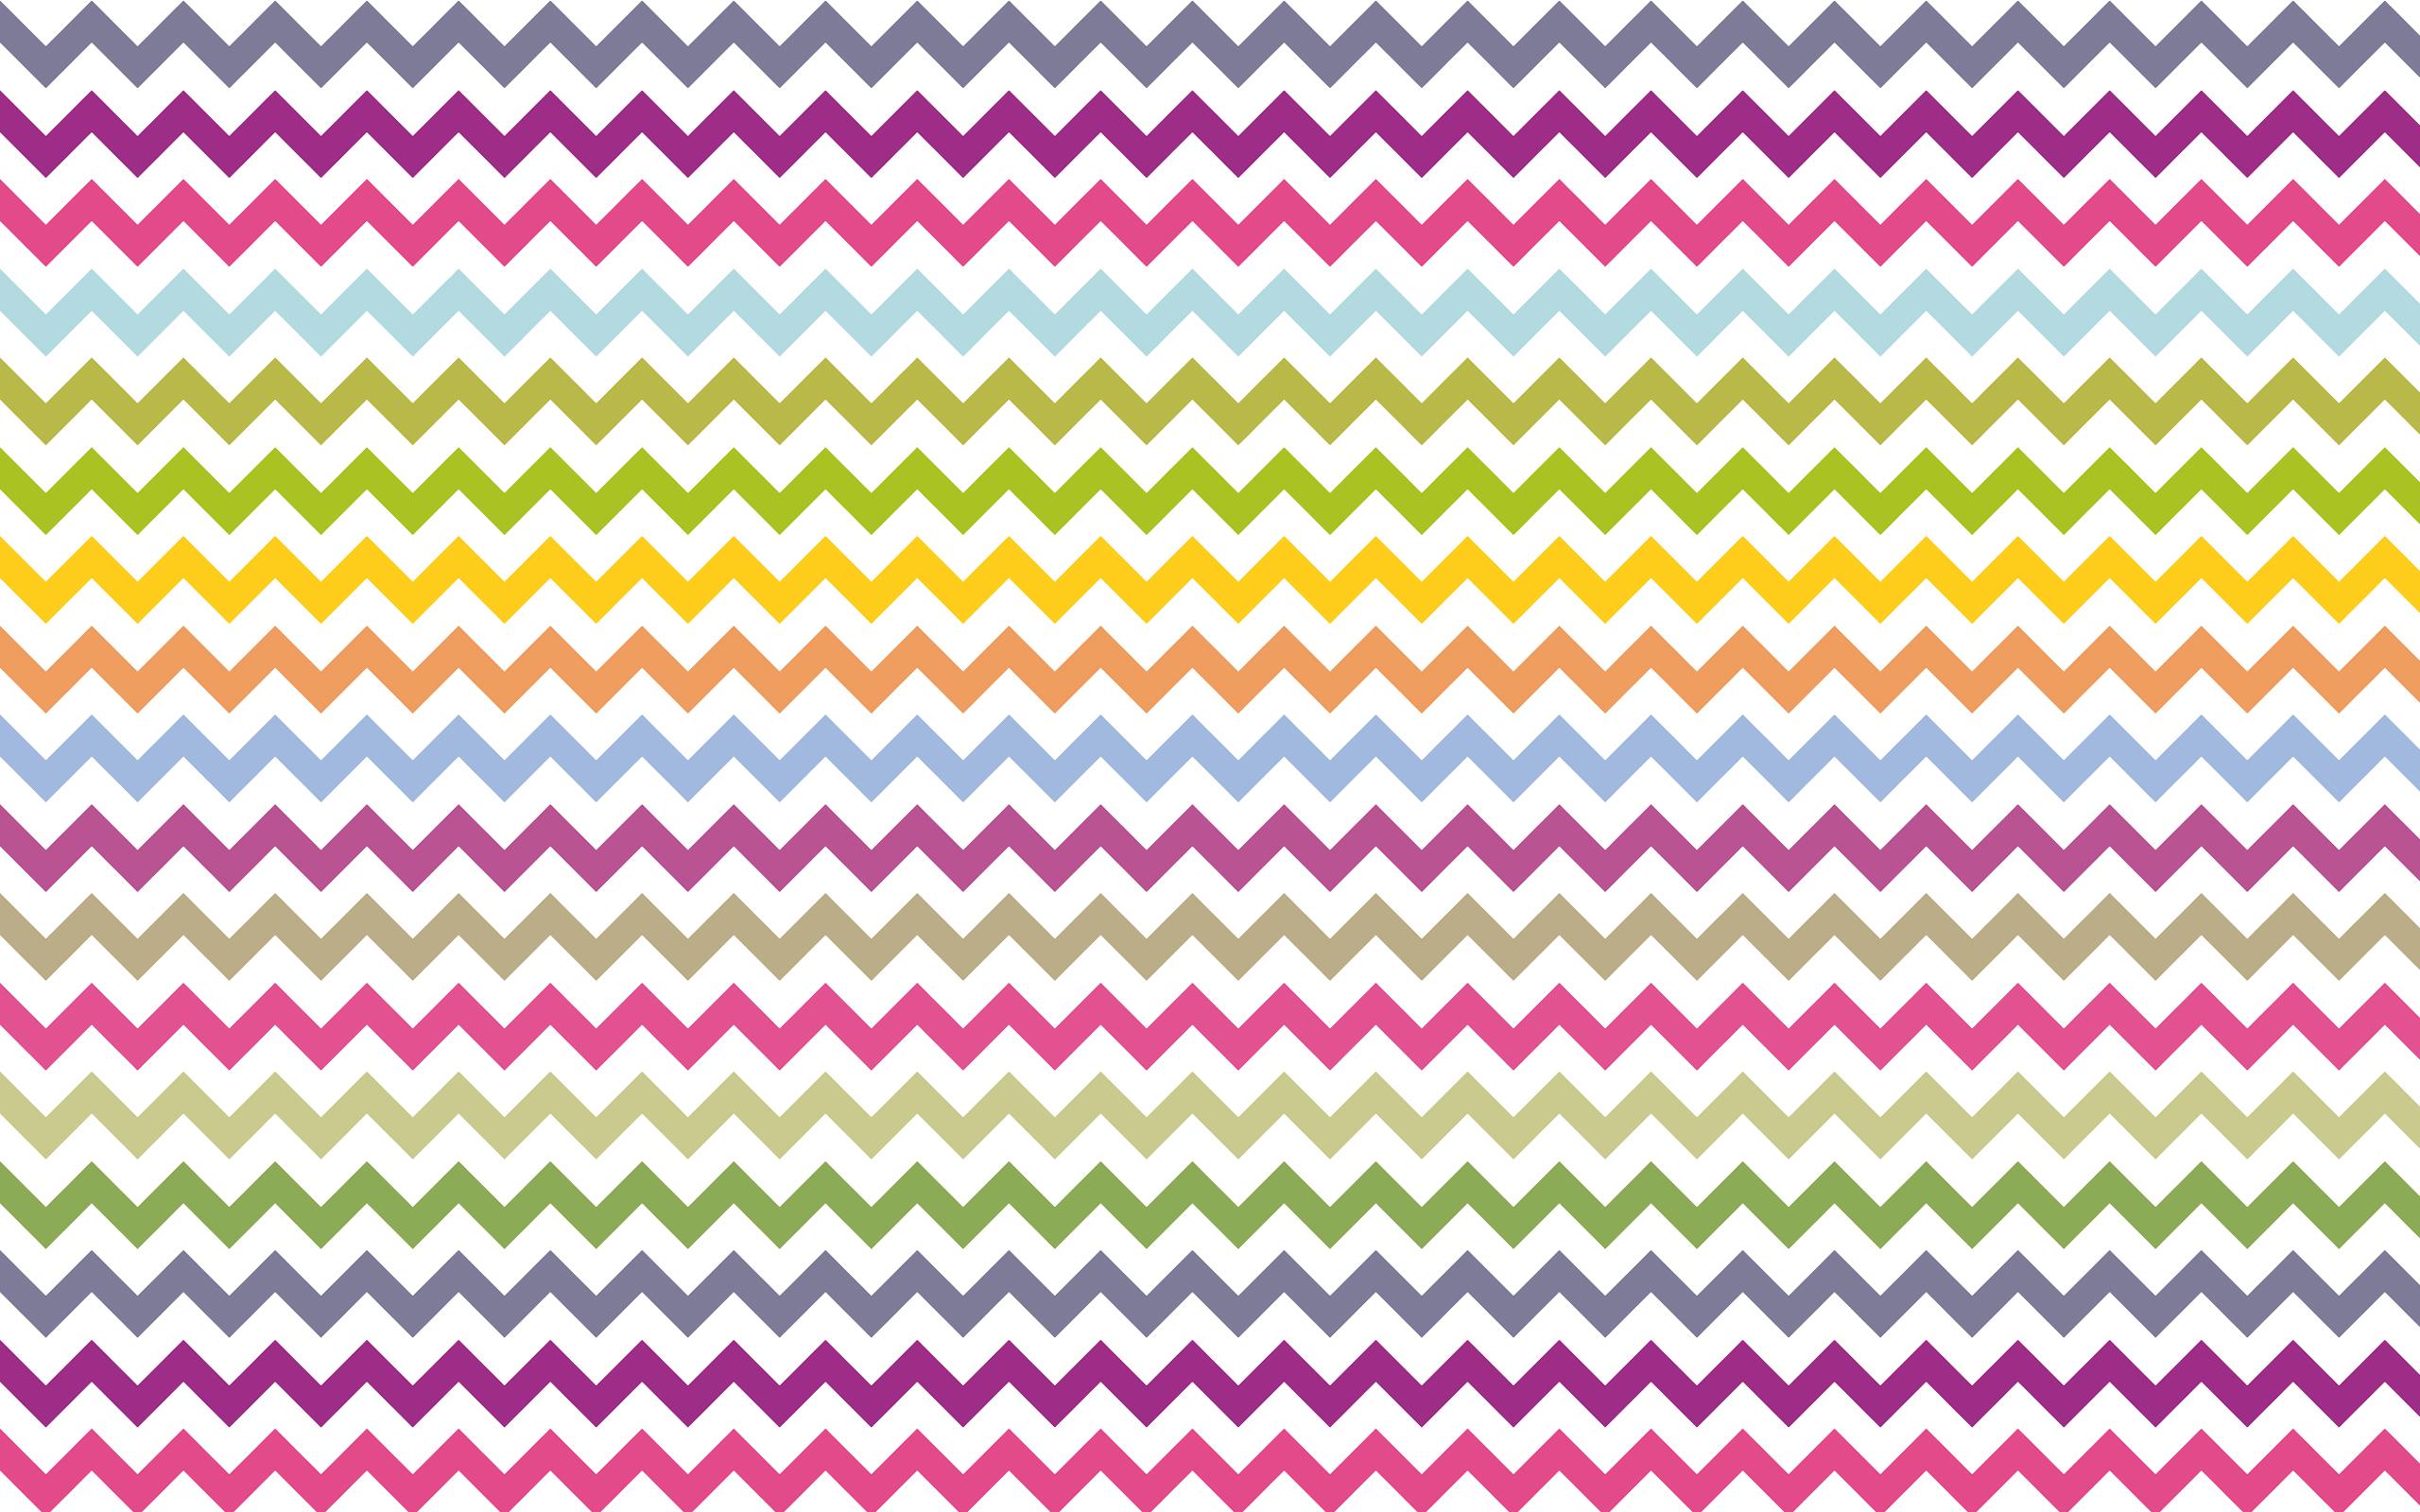 My colorful chevron desktop wallpaper   Another House Blog 2560x1600